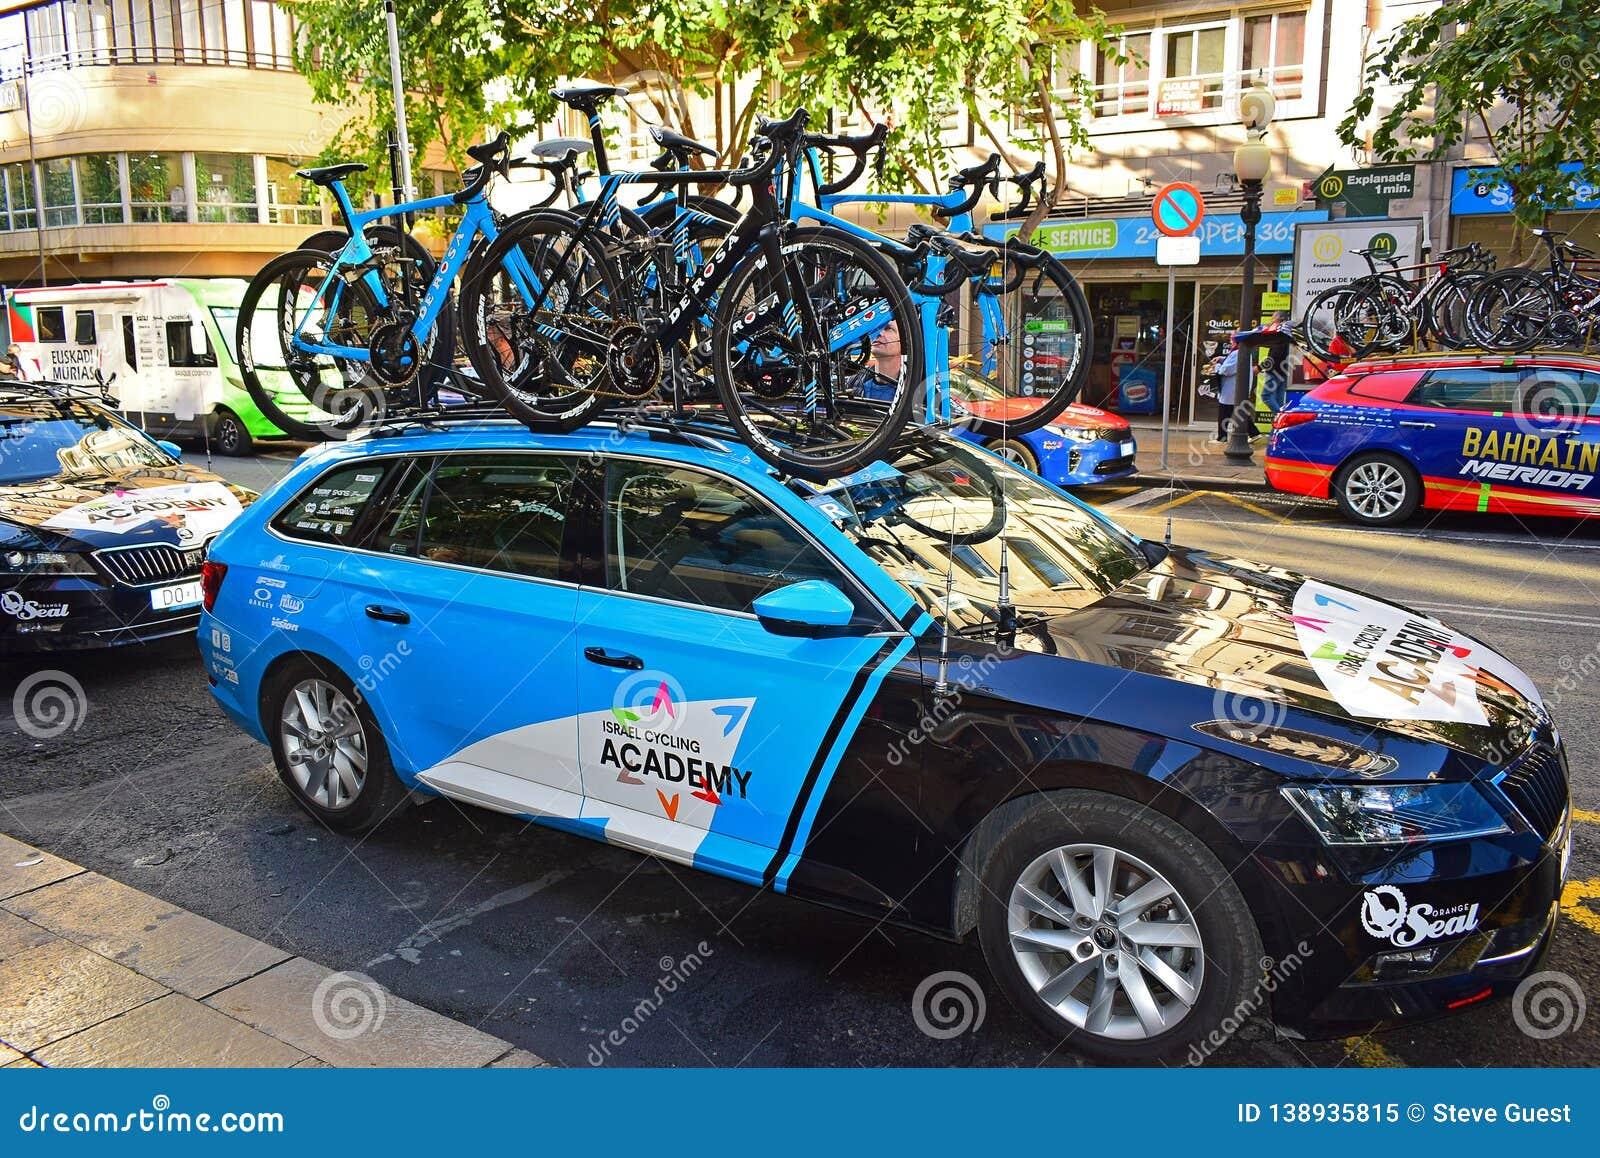 Israel cycling academy